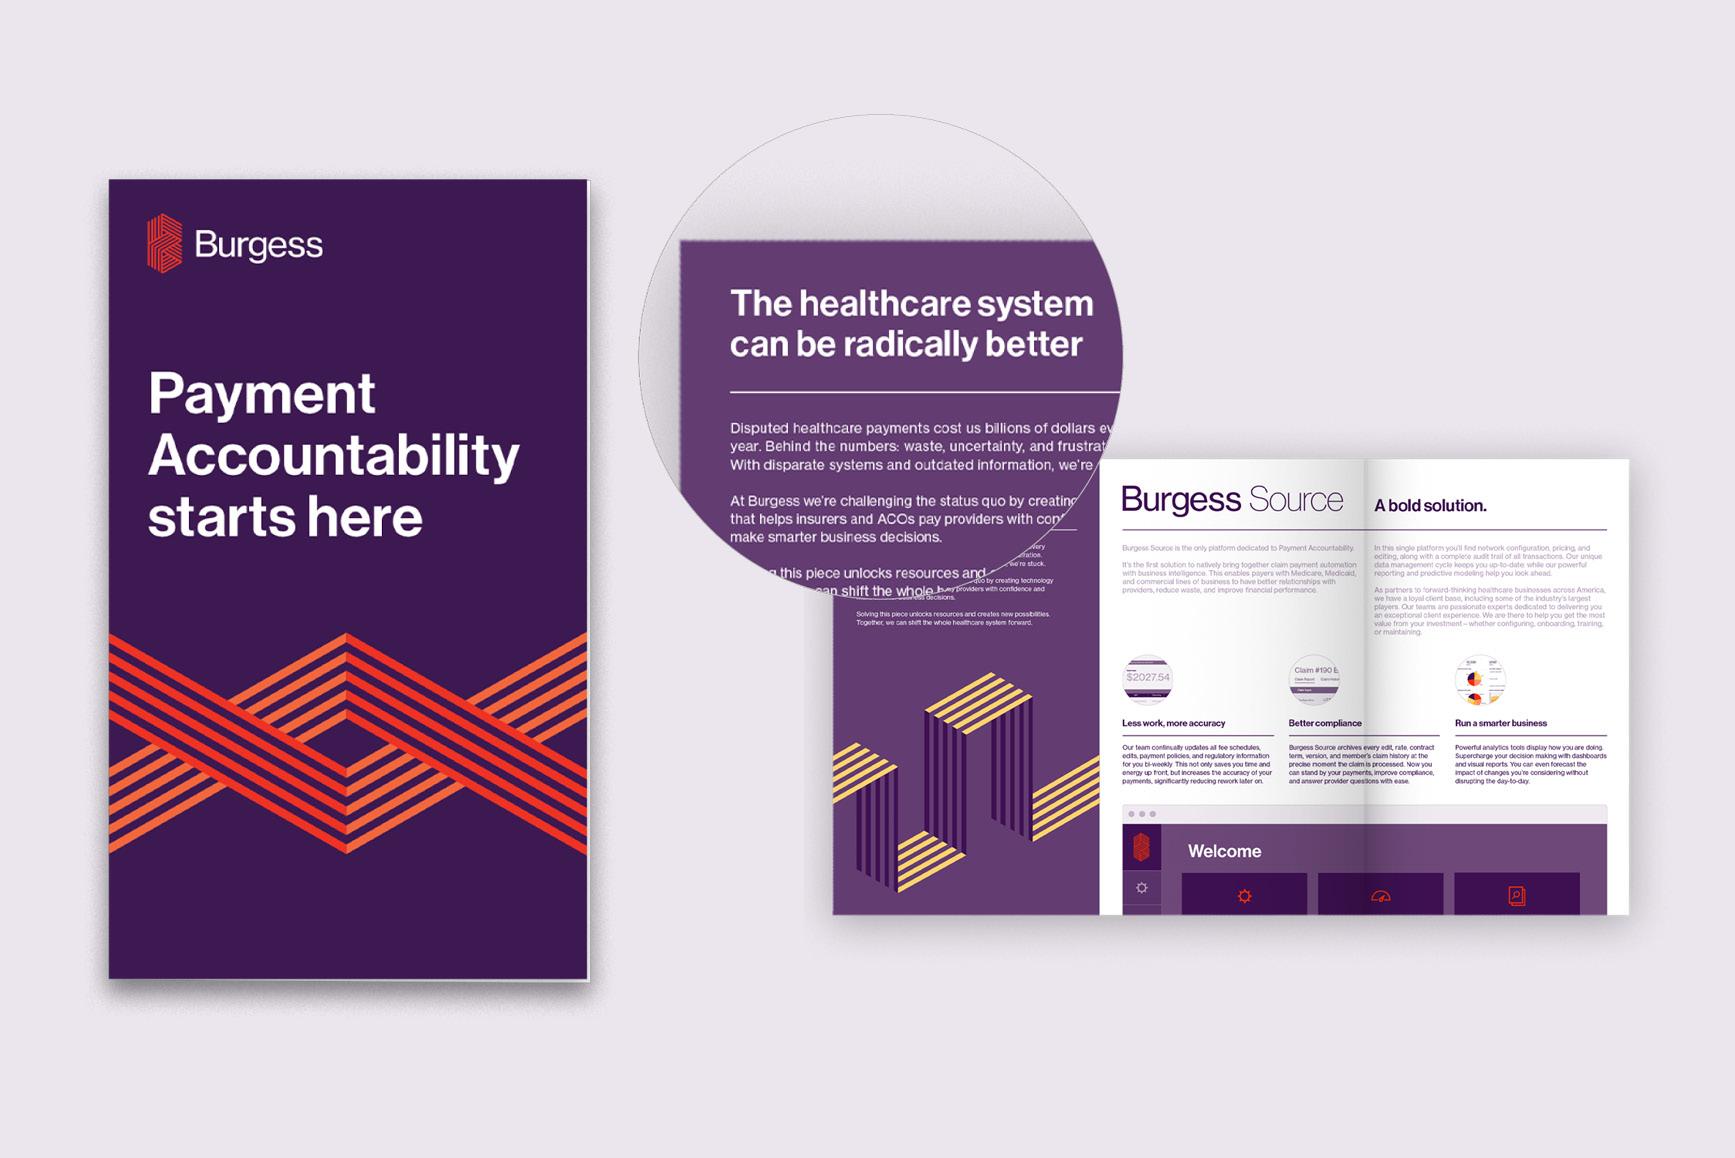 022118_Burgess_CaseStudy_v1_Guidelines_Brochure.jpg